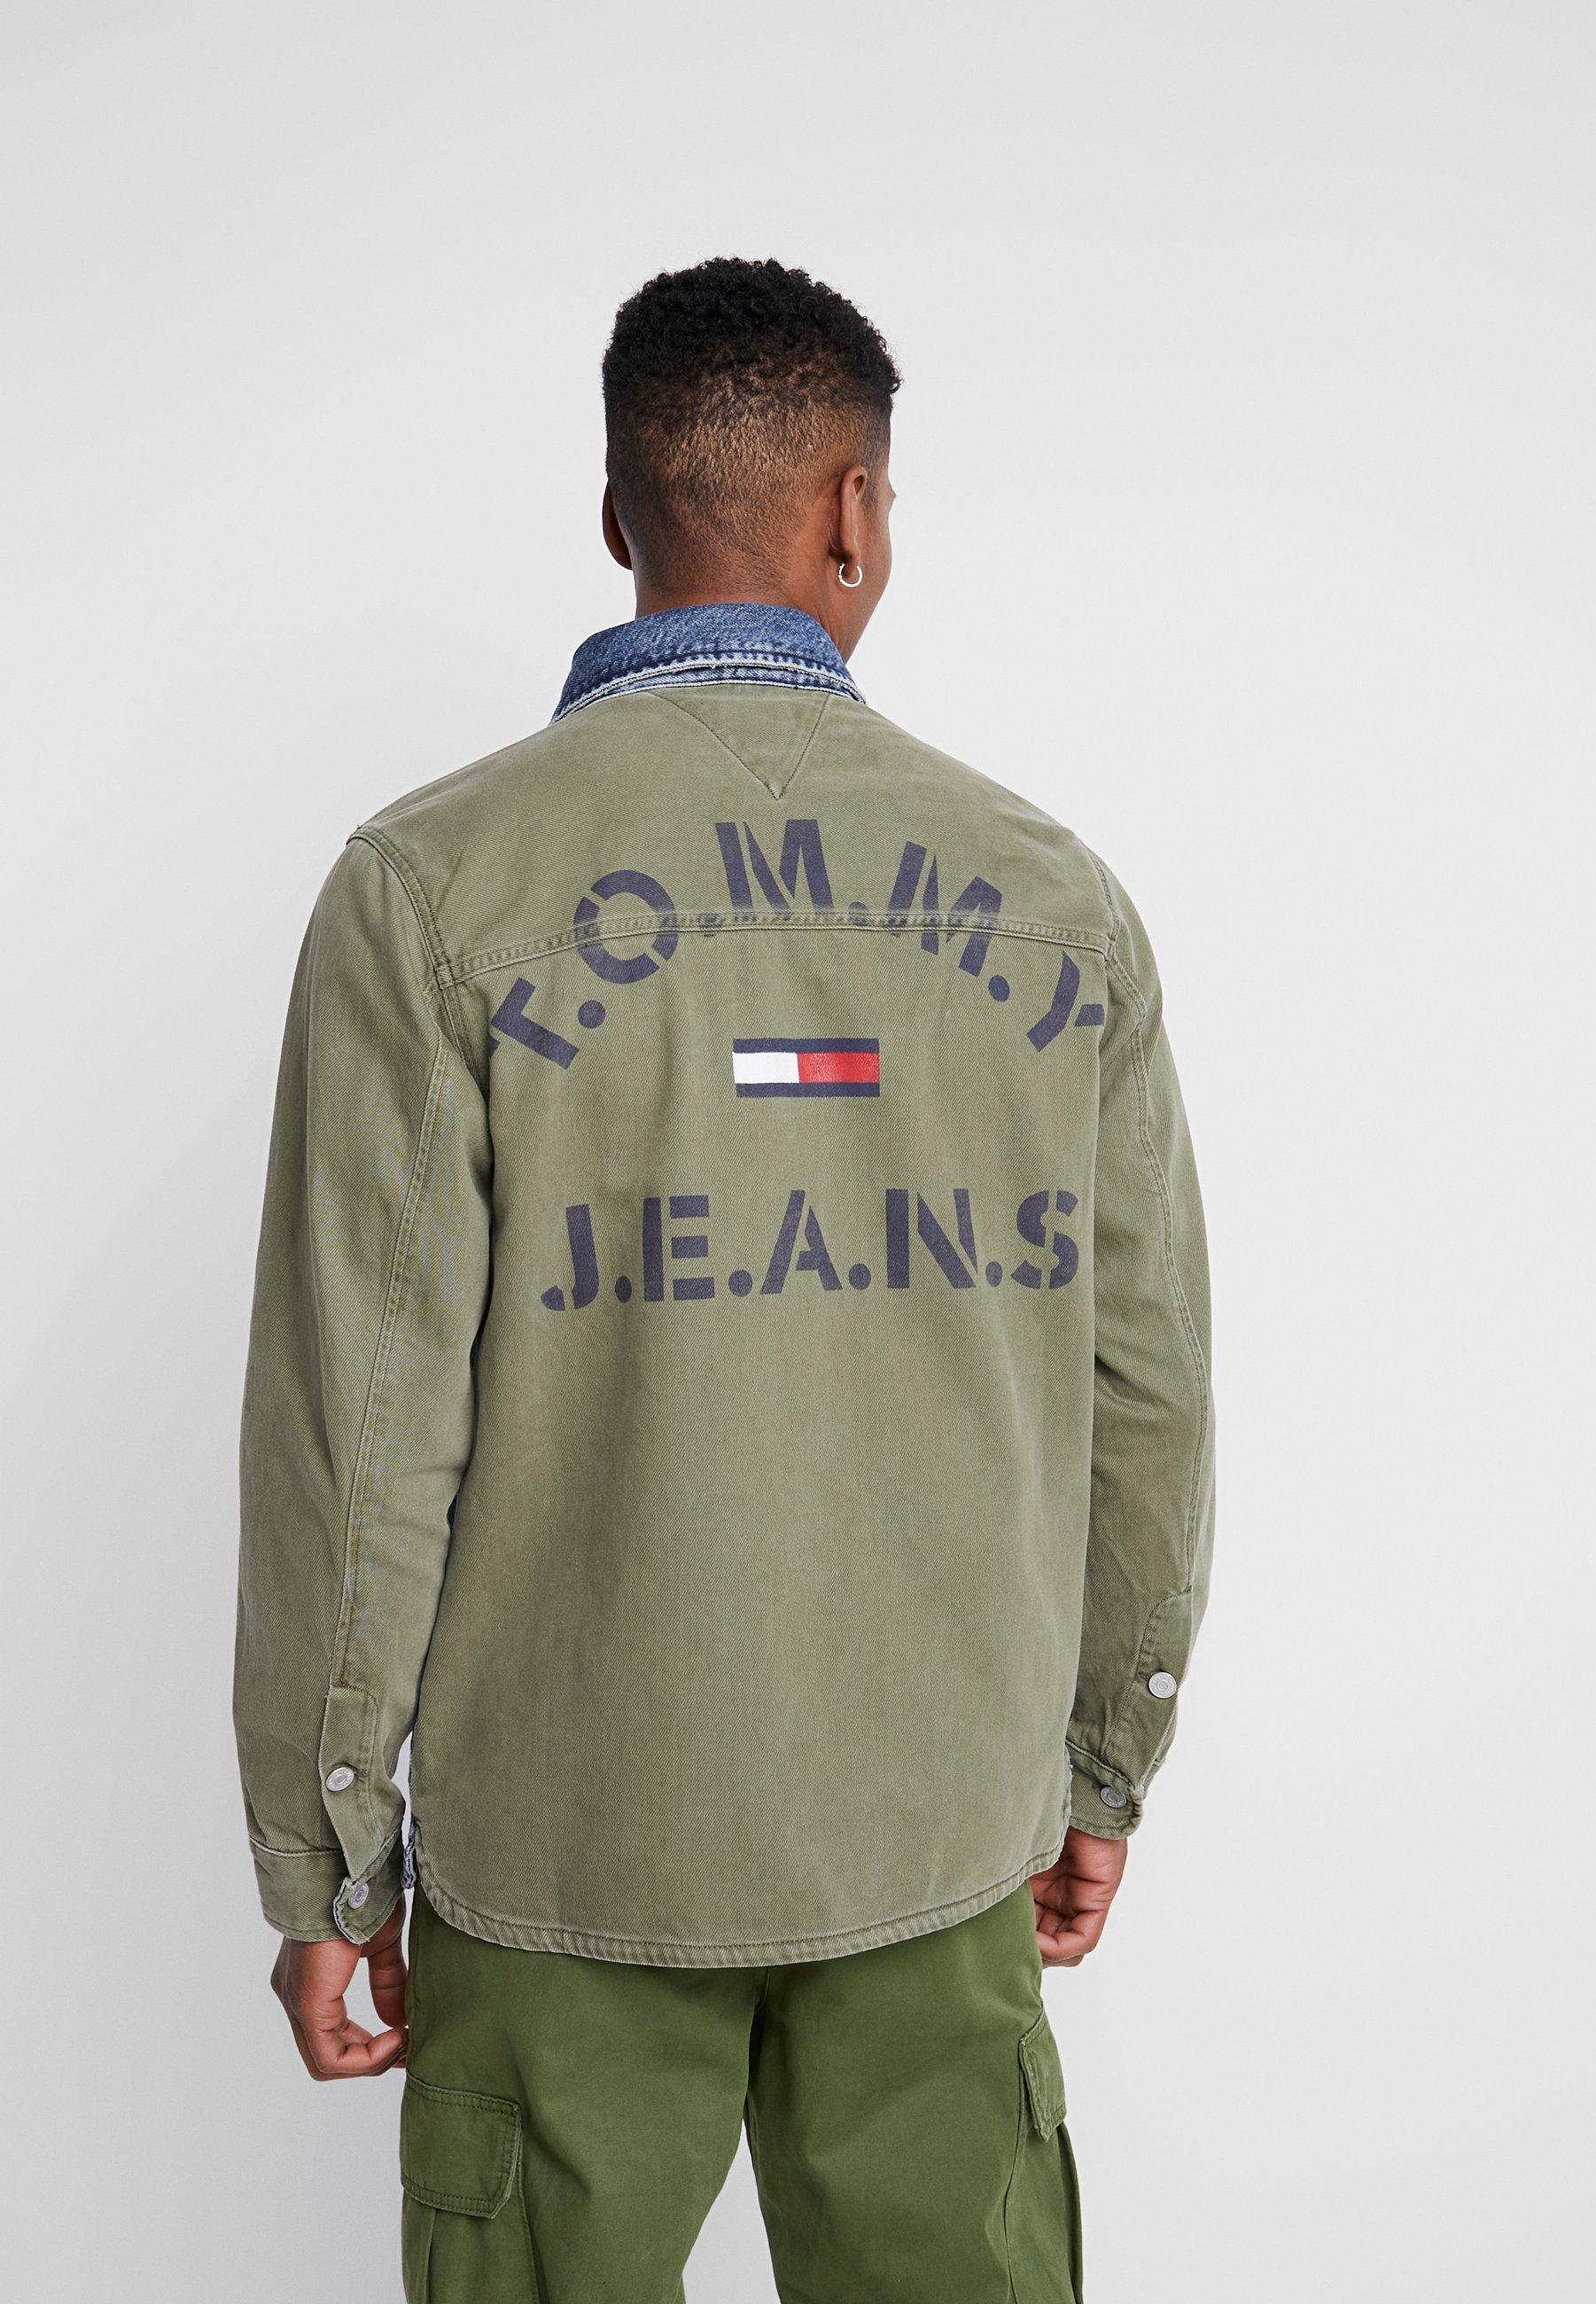 Tommy Jeans Cargo Jacket - Denim New Care Mix UK